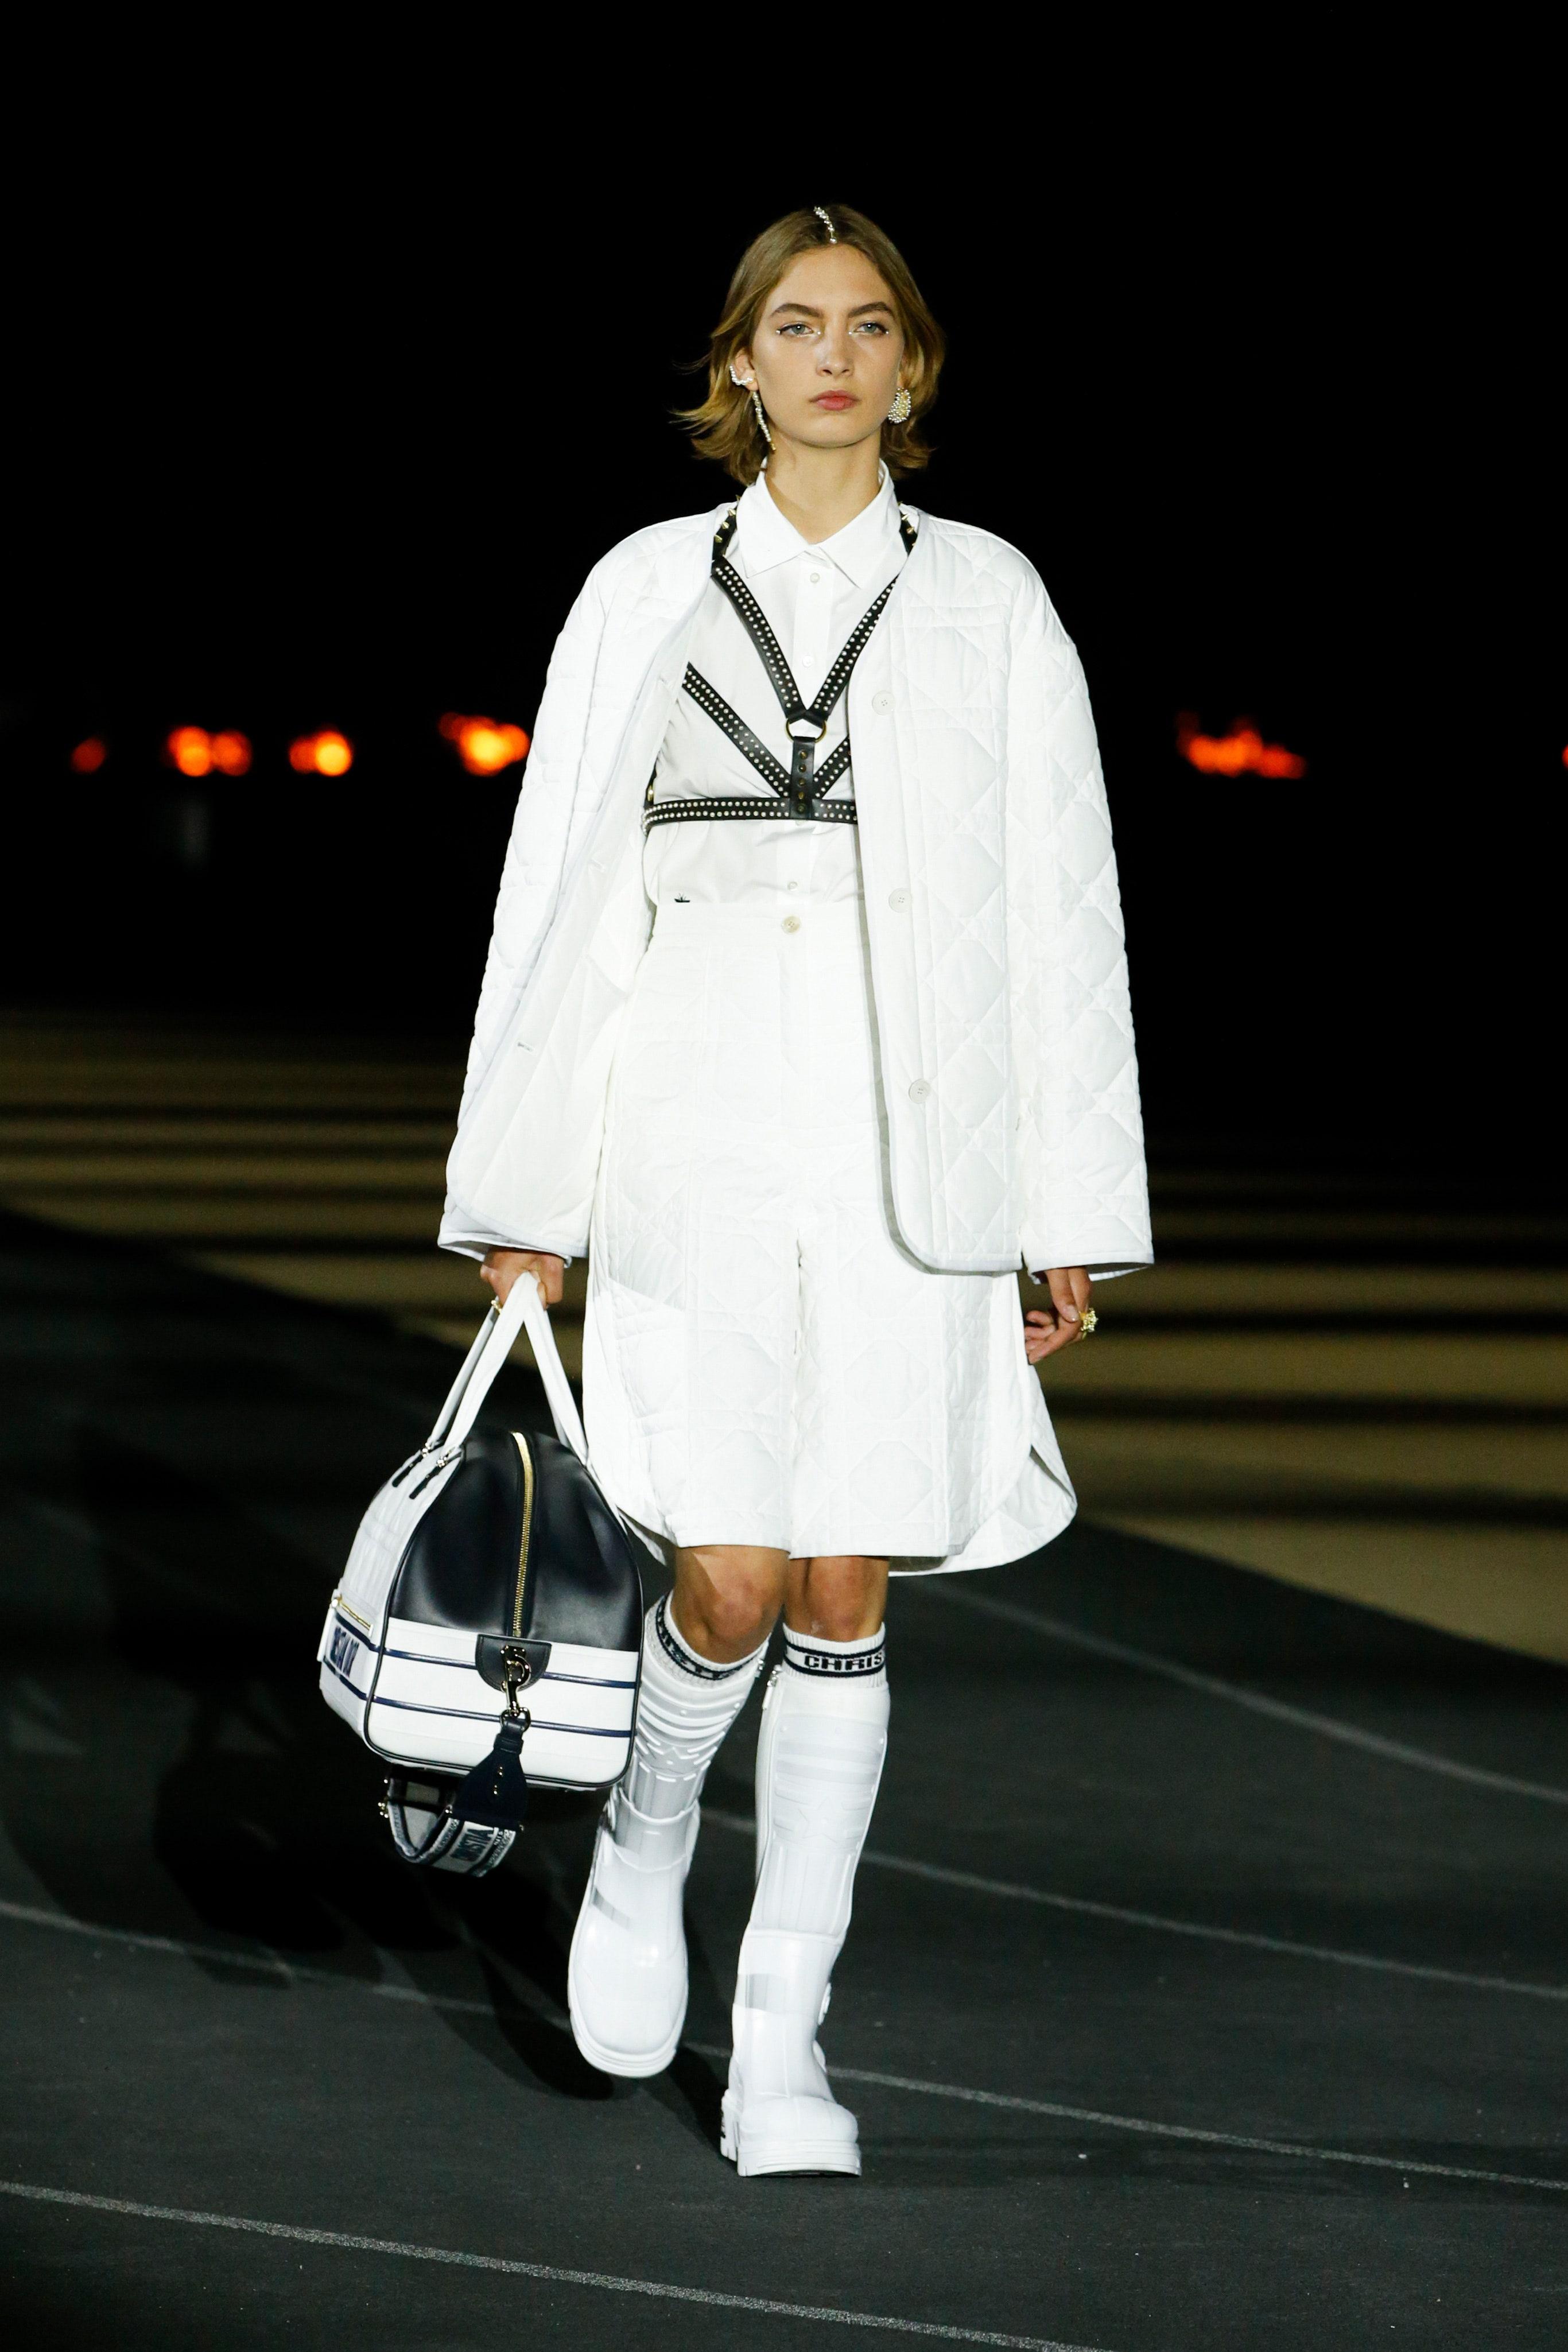 00002-Dior-Resort-2022-credit-brand.jpeg